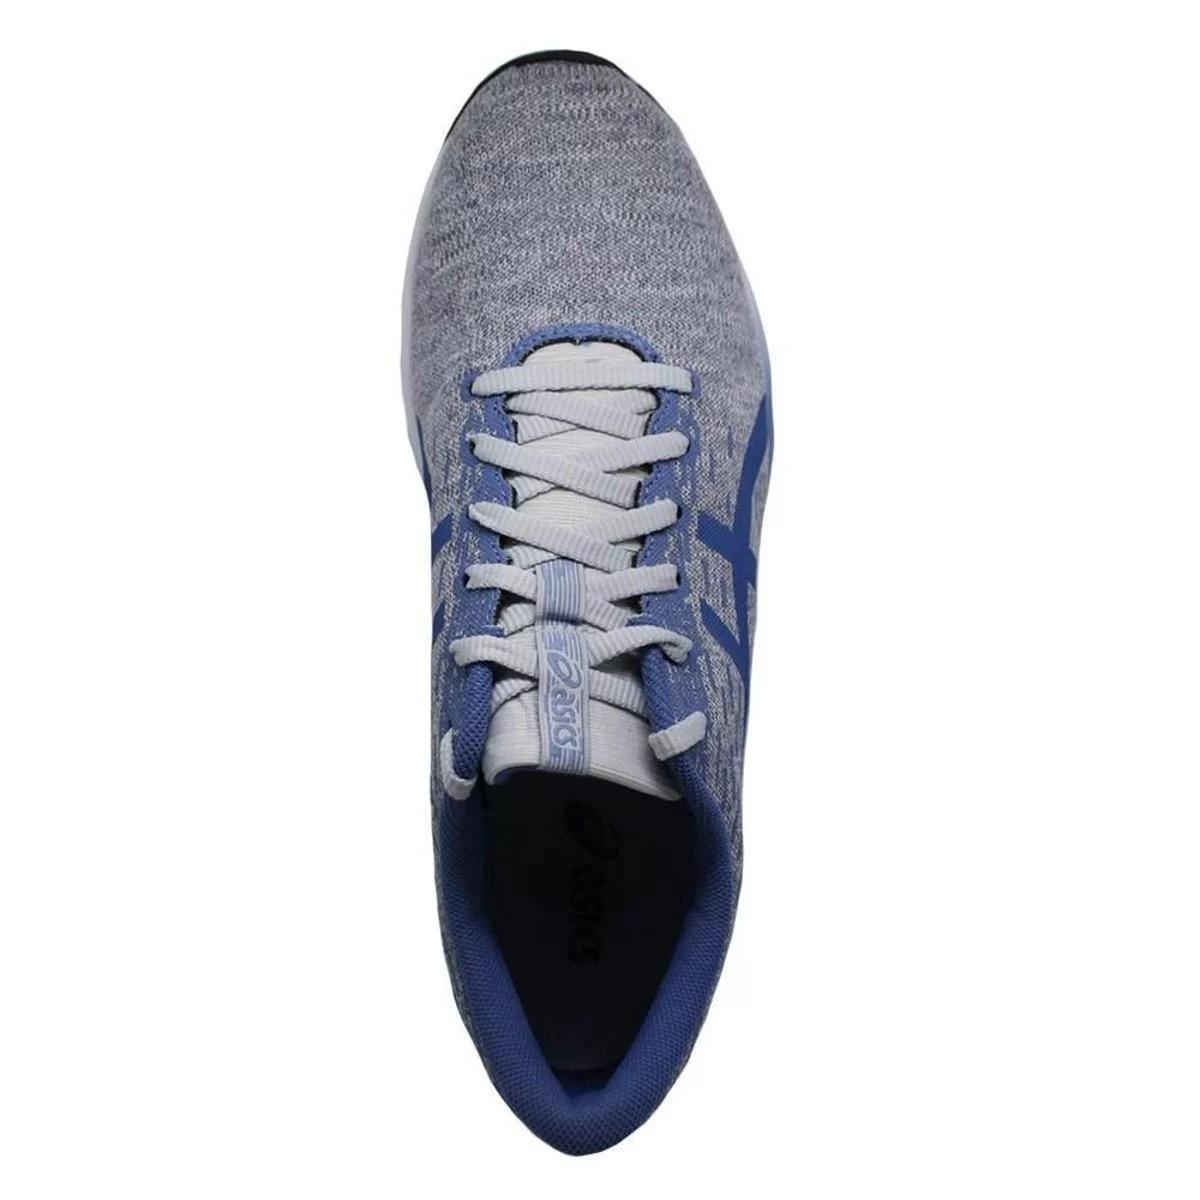 Tênis Asics Streetwise Masculino Cinza e Azul